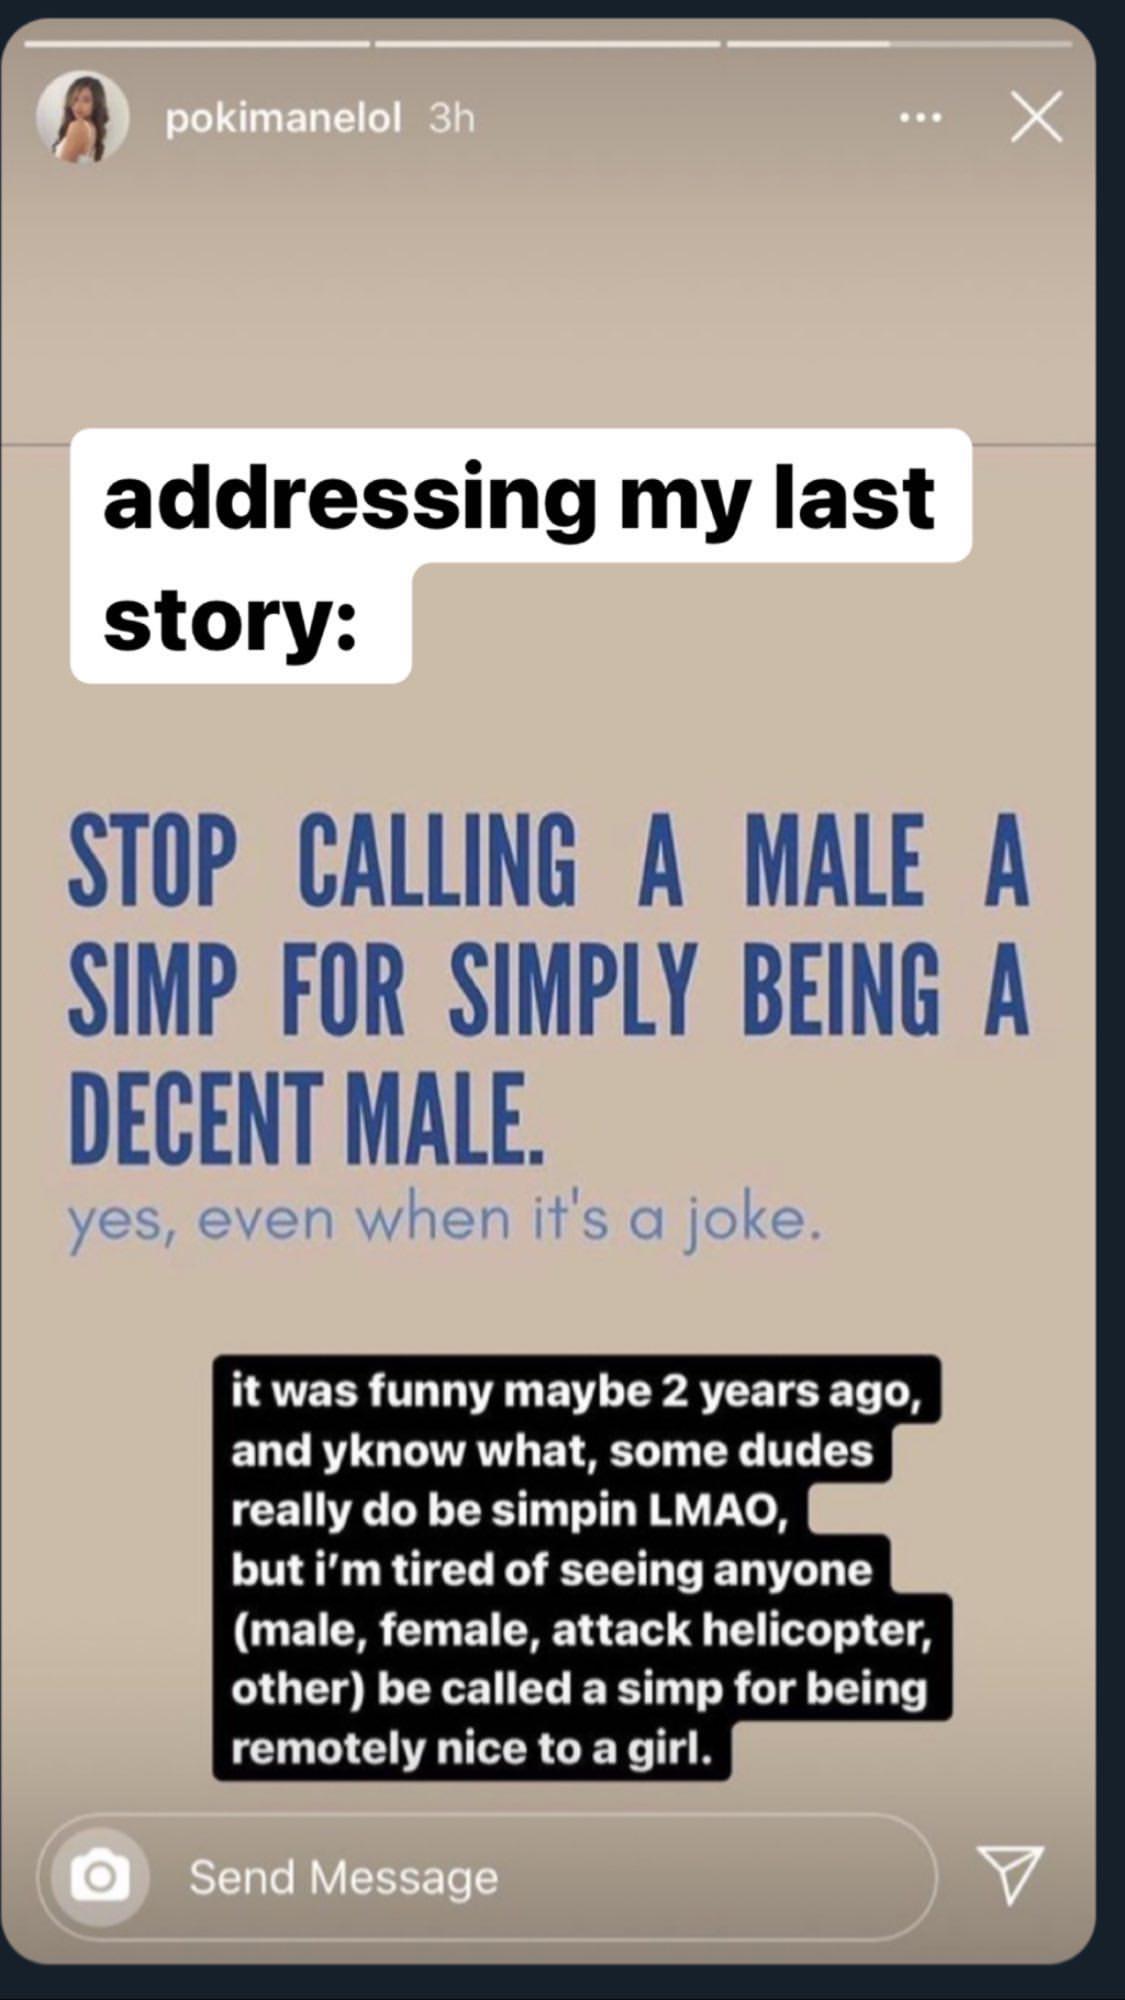 Pokimane transphobic slur